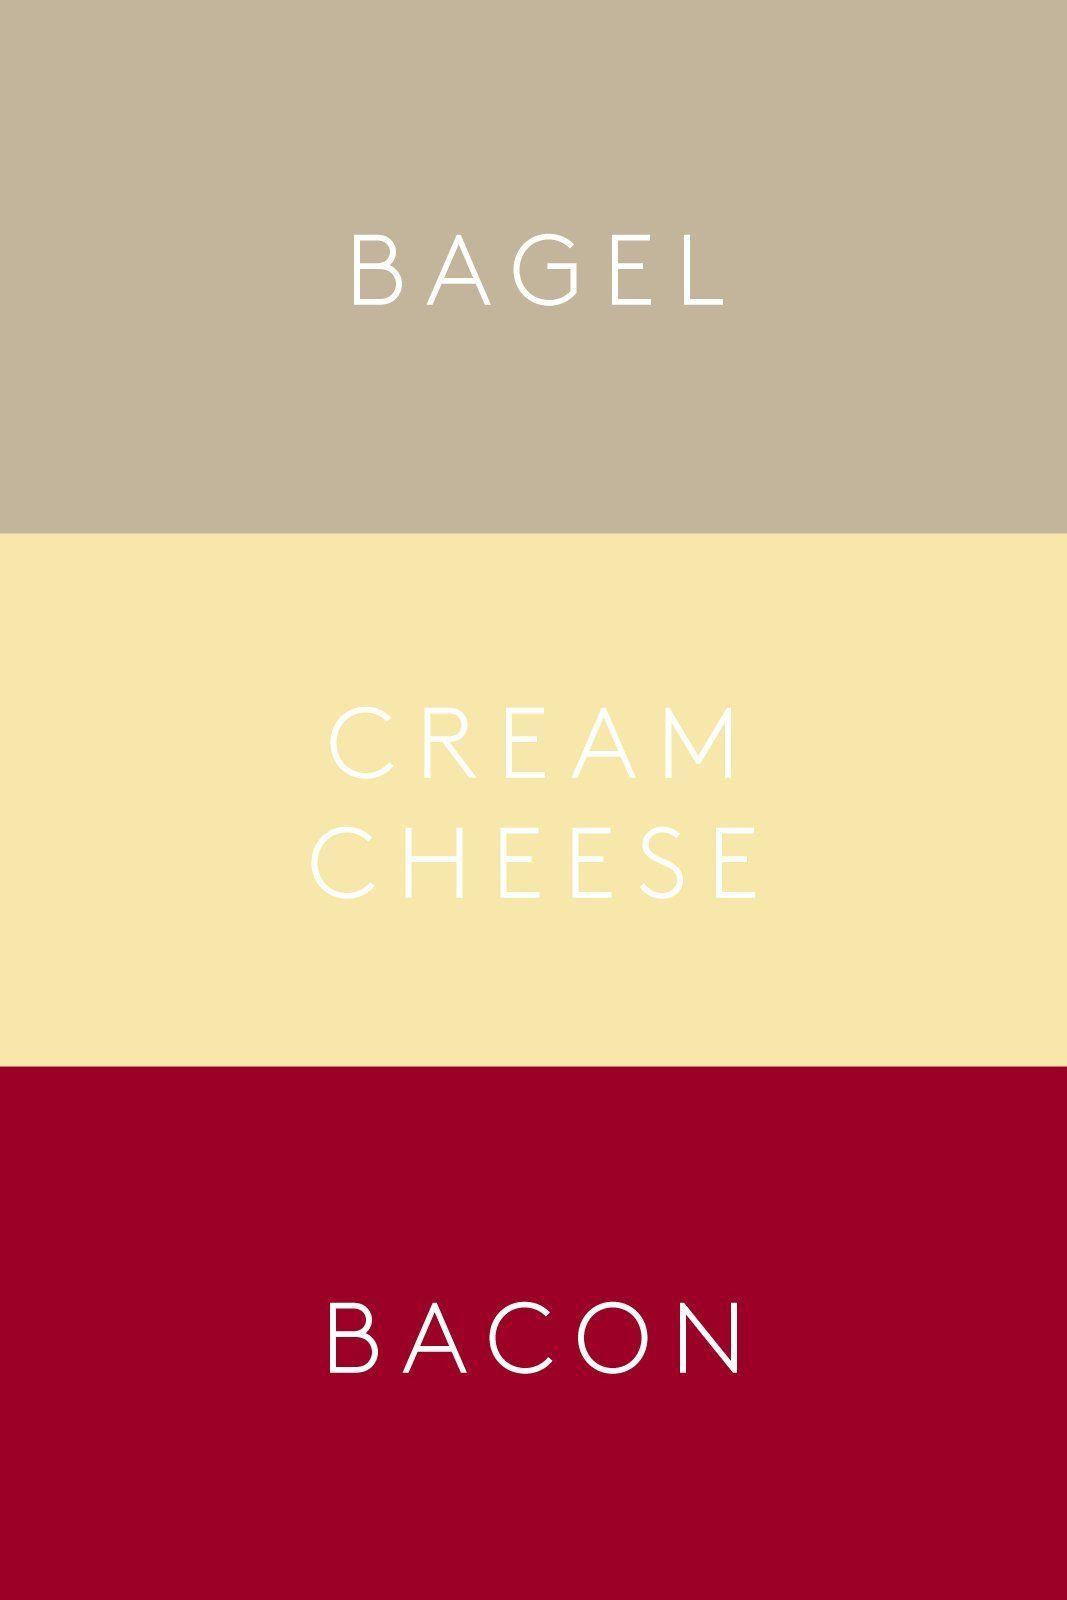 Weird Food Combinations #weird food cravings The Weirdest Food Combos We Secretly Love